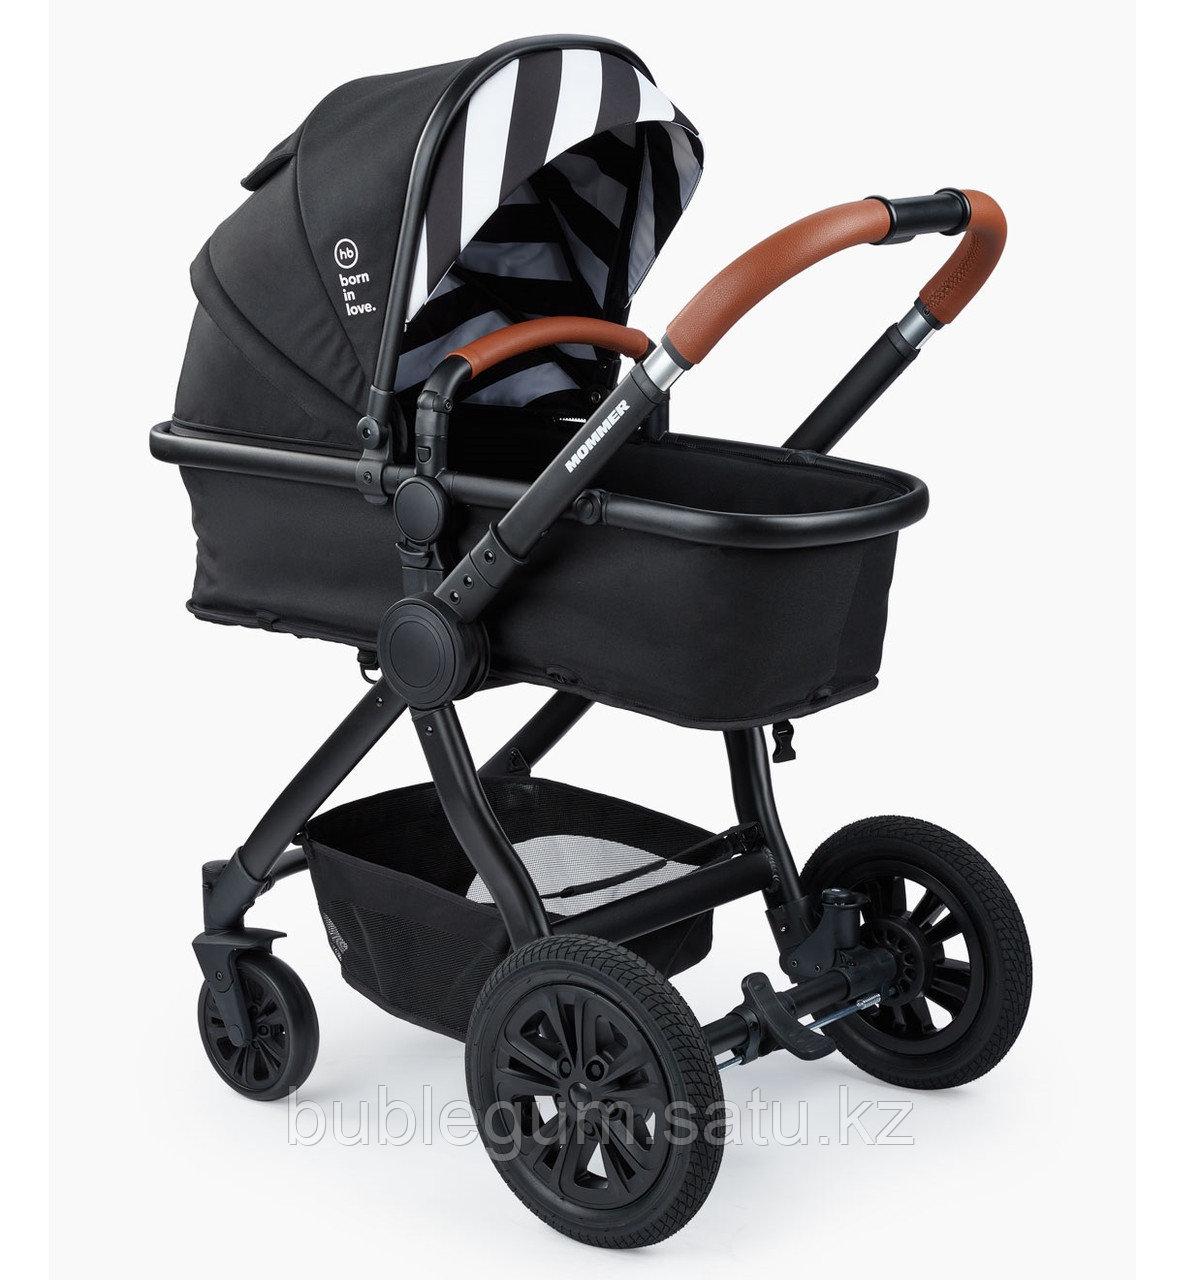 Коляска-трансформер Happy Baby 2в1 MOMMER (black), с 0 до 3 лет